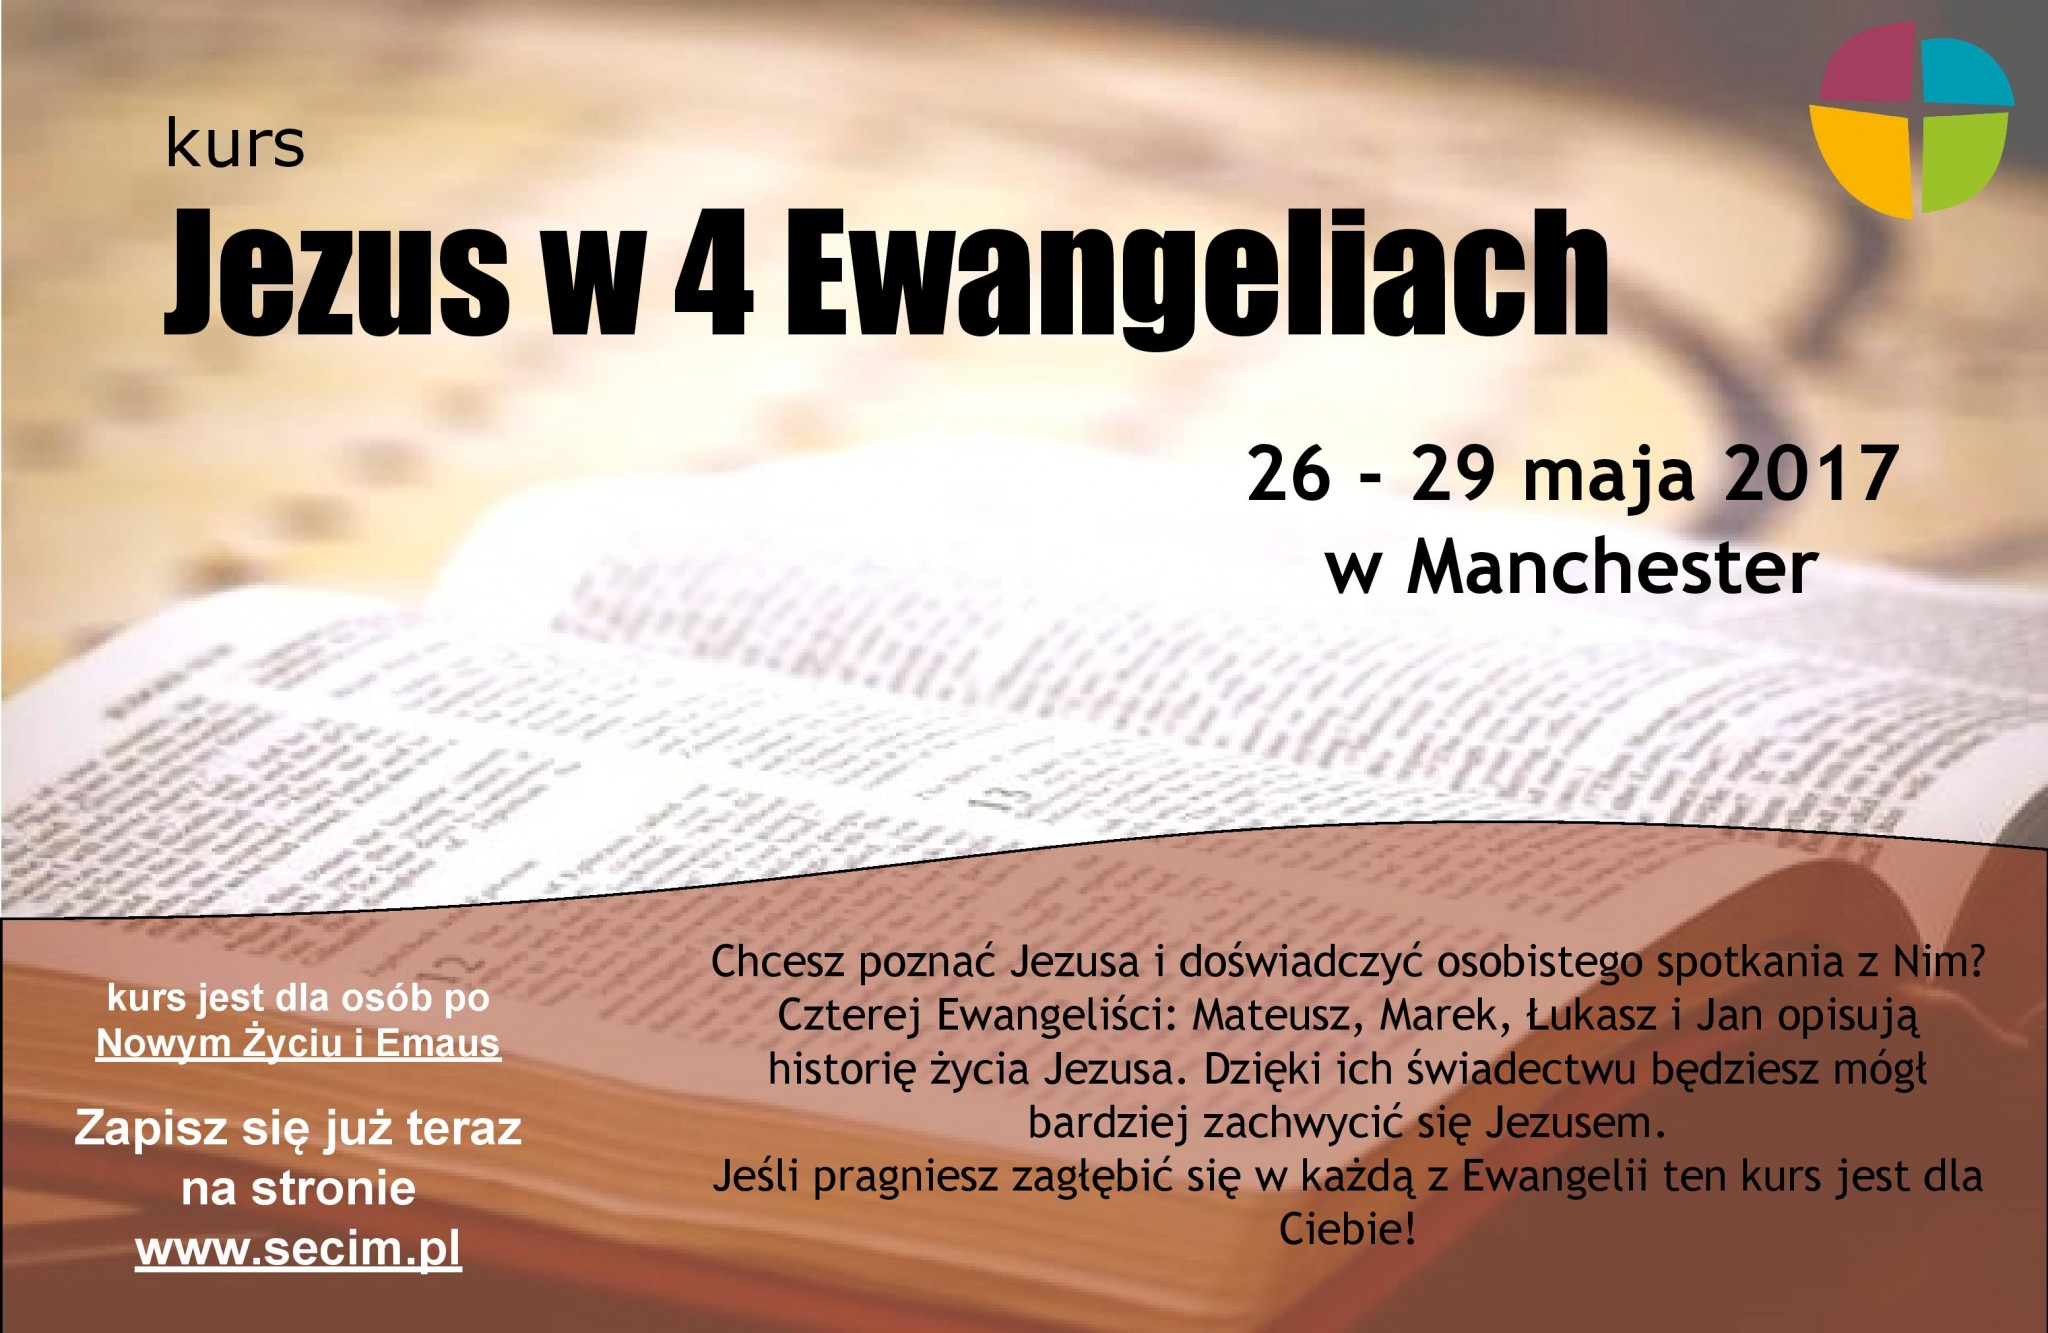 Kurs Jezus w 4 Ewangeliach, Manchester